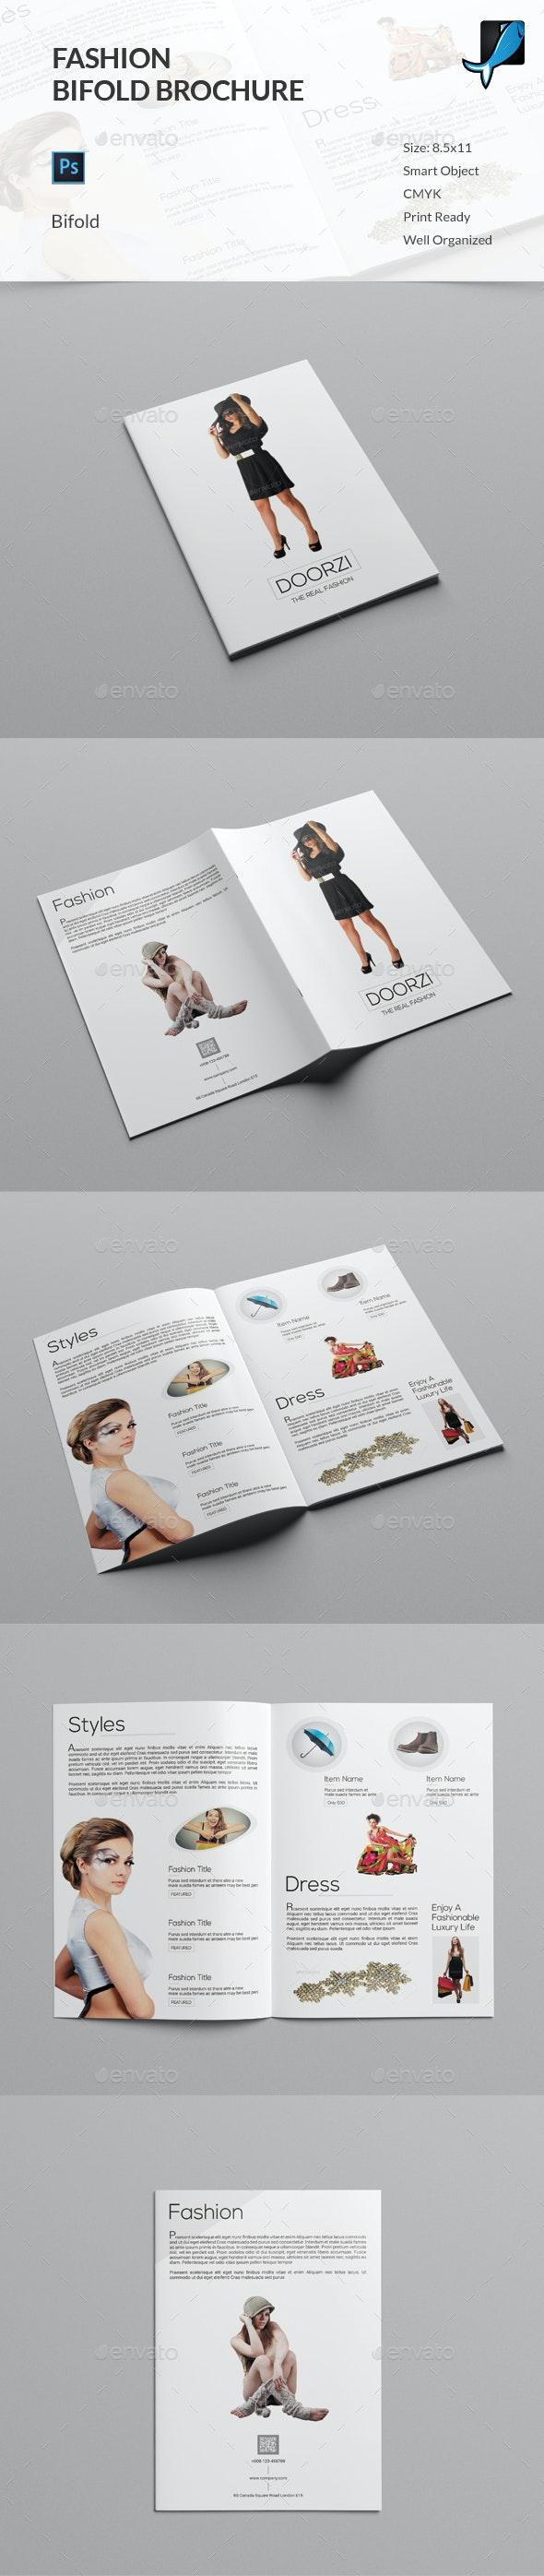 Fashion Bifold Brochure - Catalogs Brochures